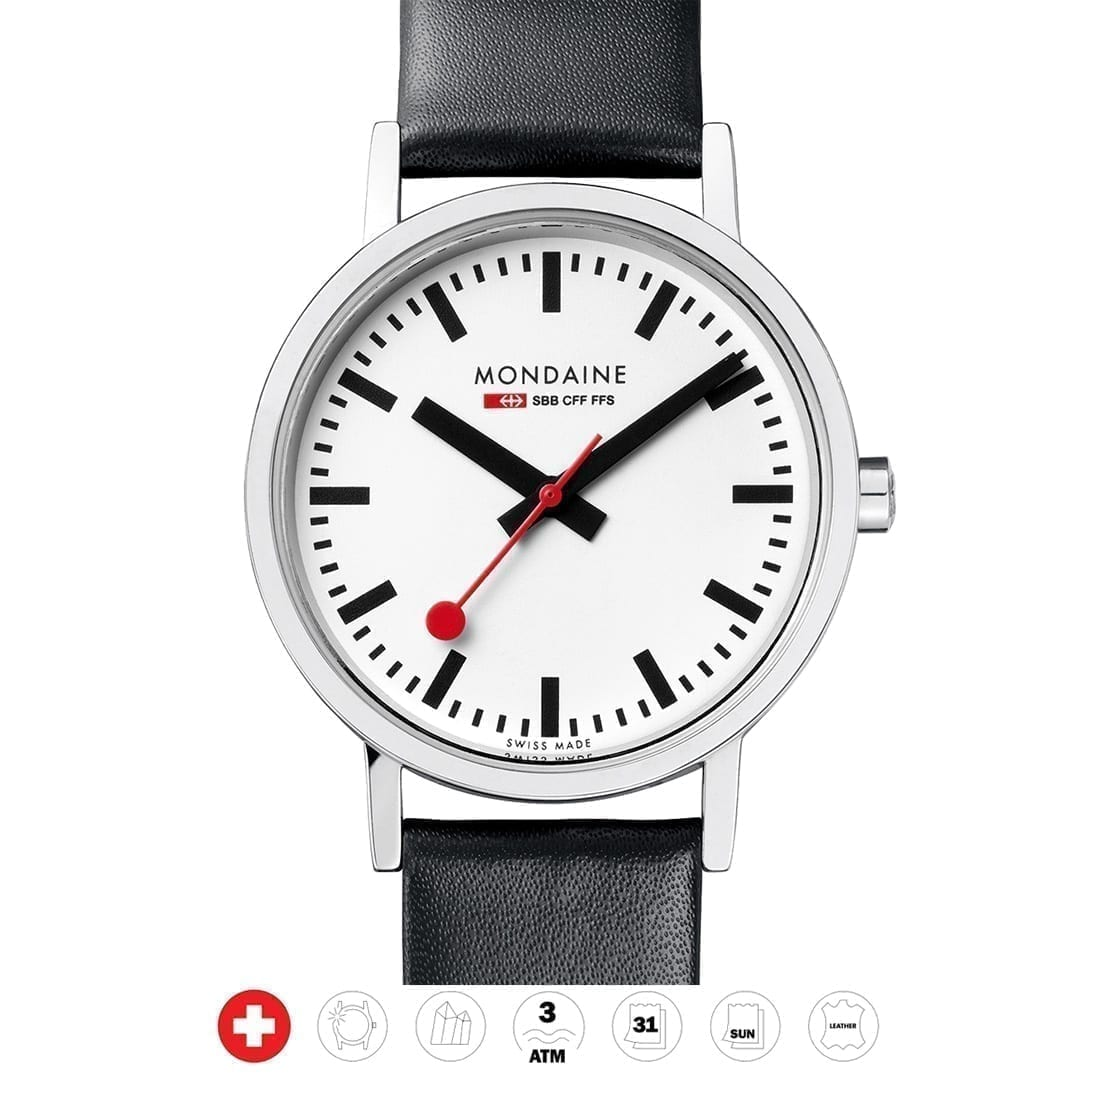 Mondaine wristwatch classic a658 11sbb black white swiss made direct - Mondaine travel clock ...